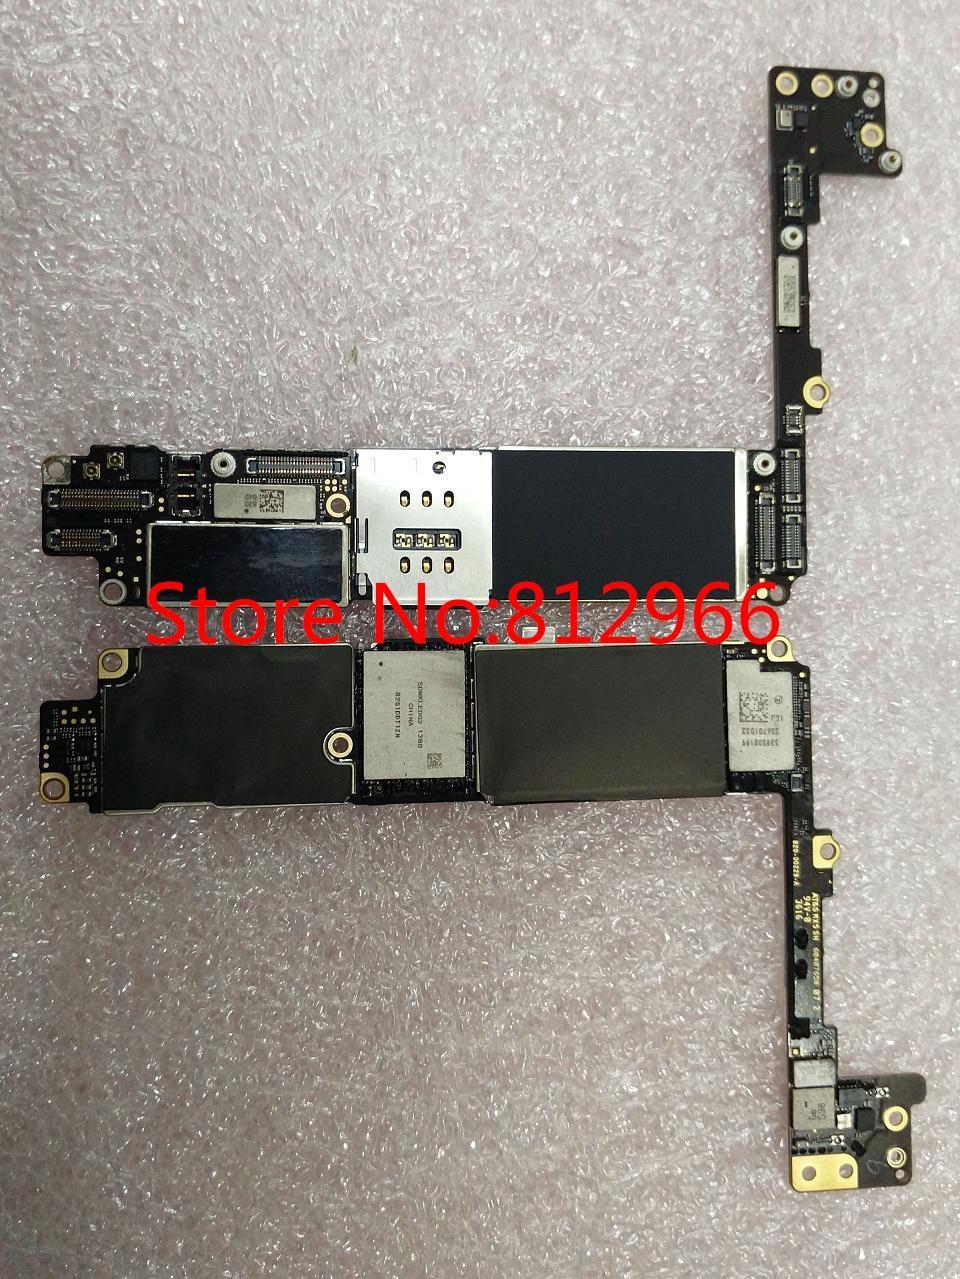 Motherboard Iphone Price 6 Plus